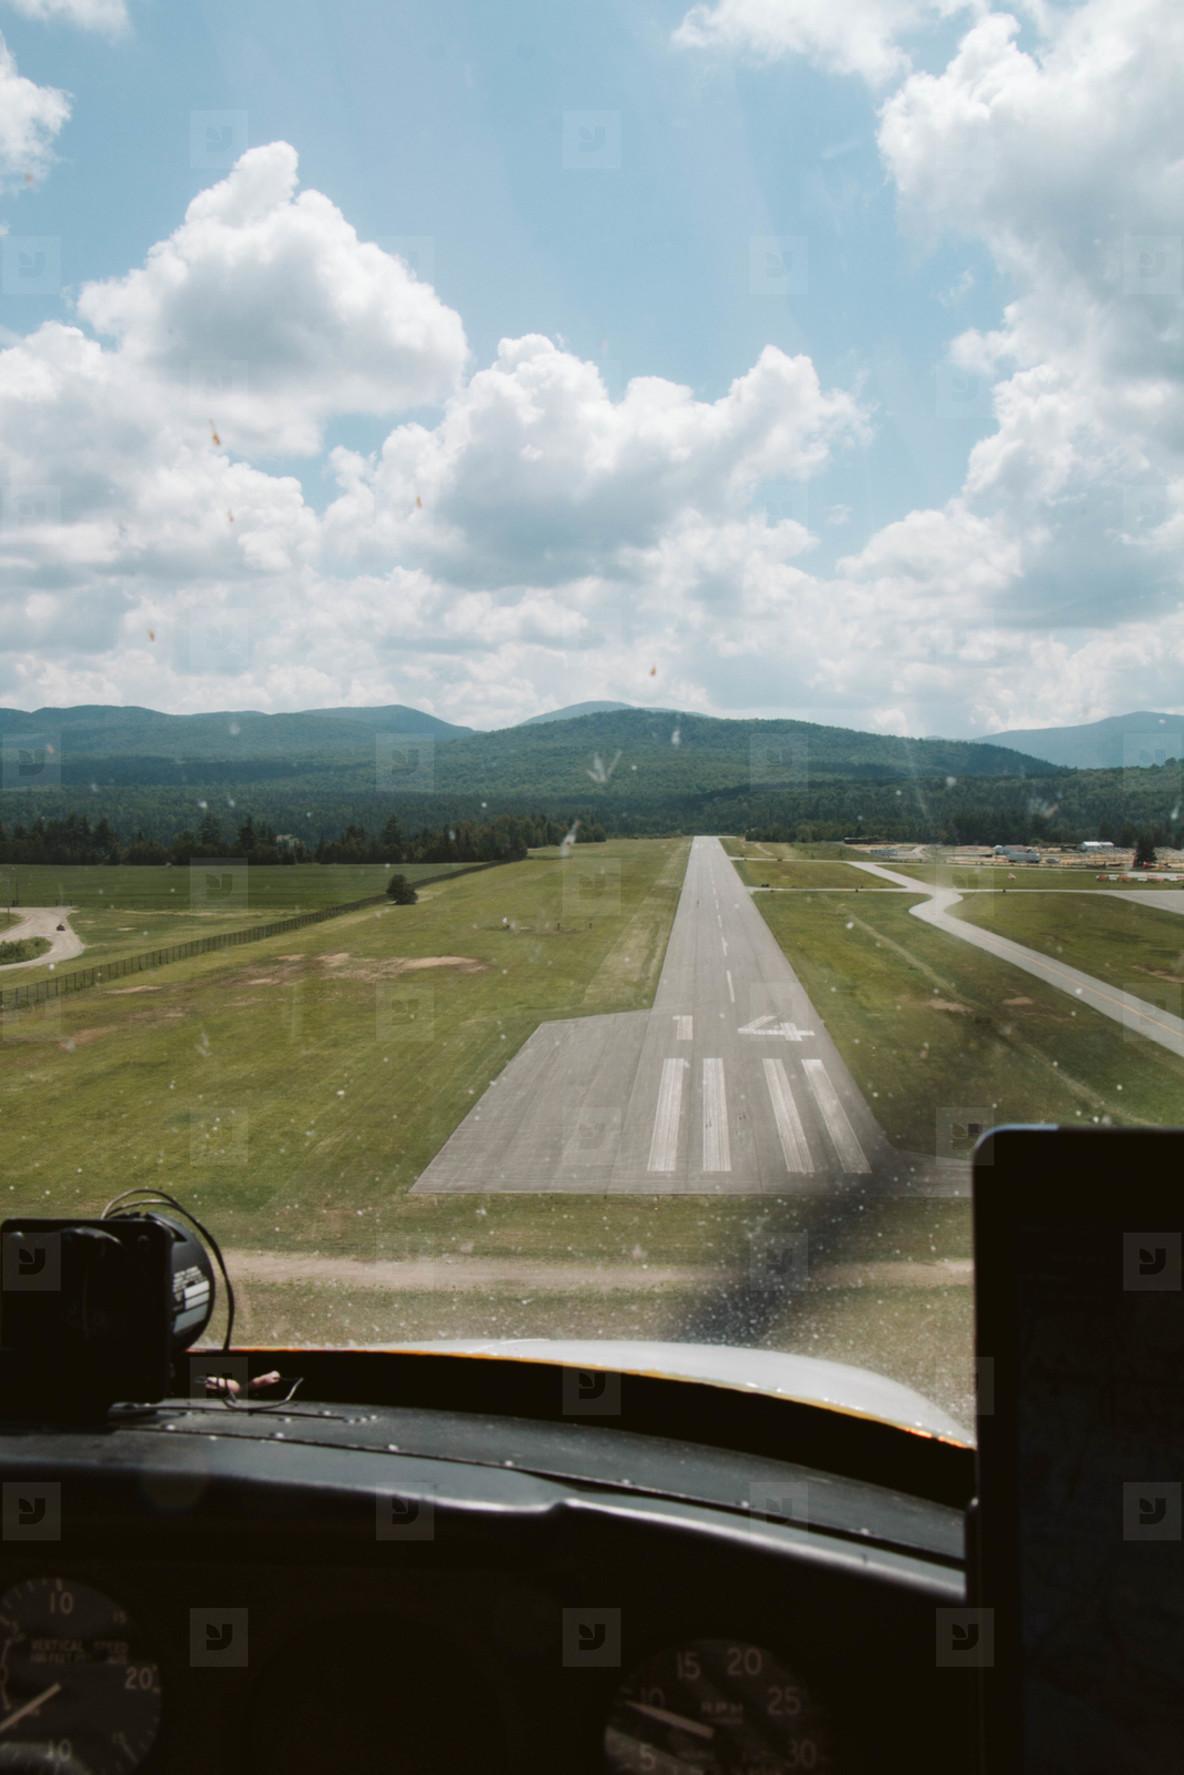 Landing on runway